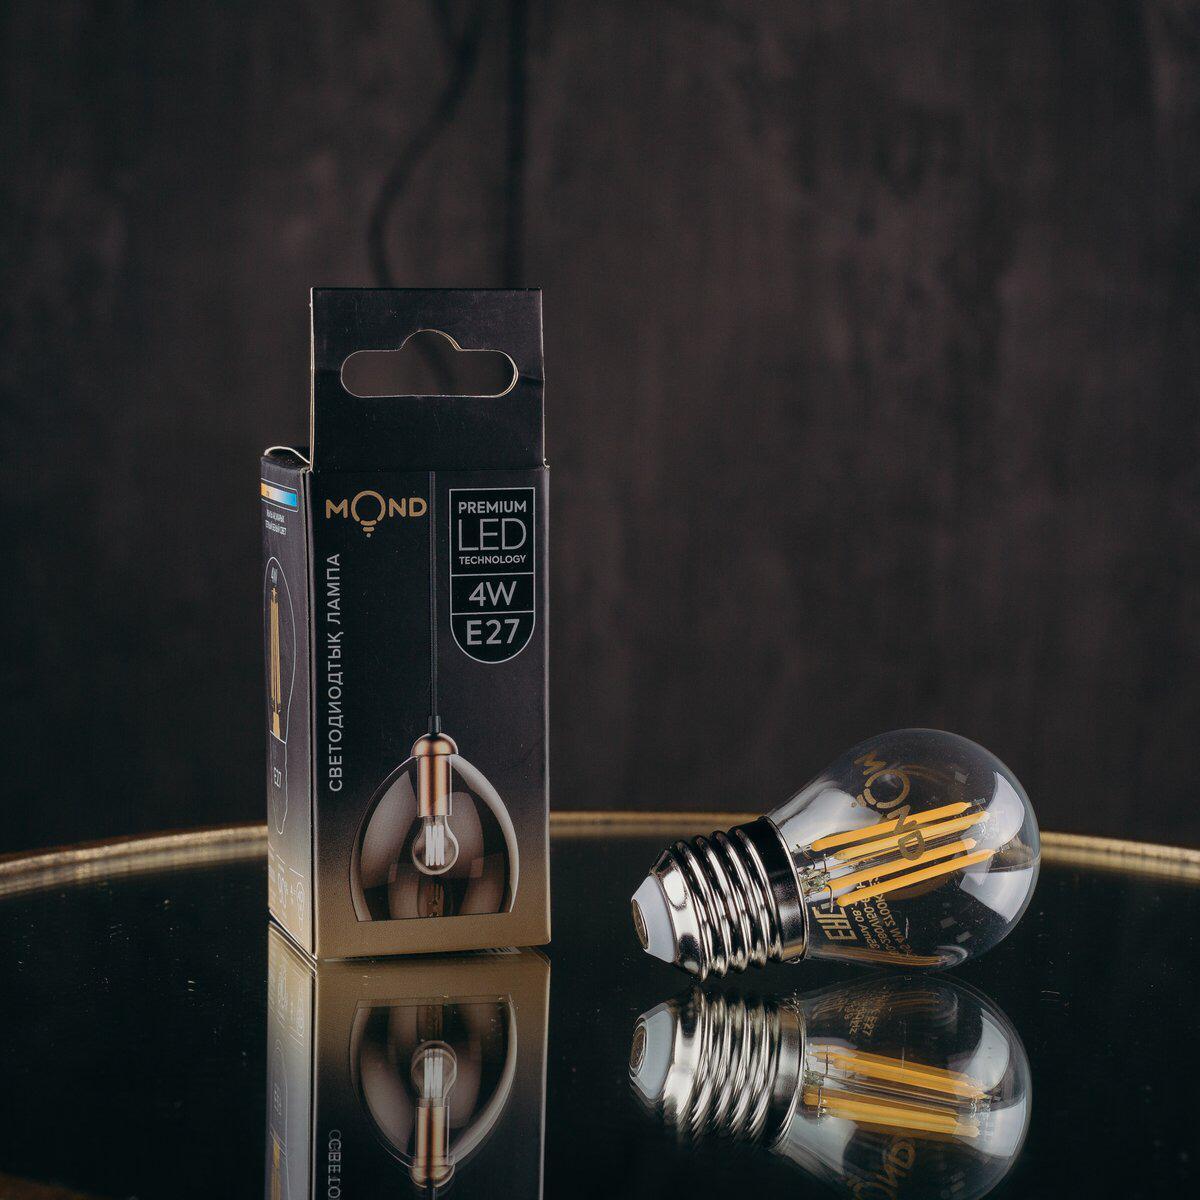 LED Лампа Filament 4W G45 4000K E27 MOND